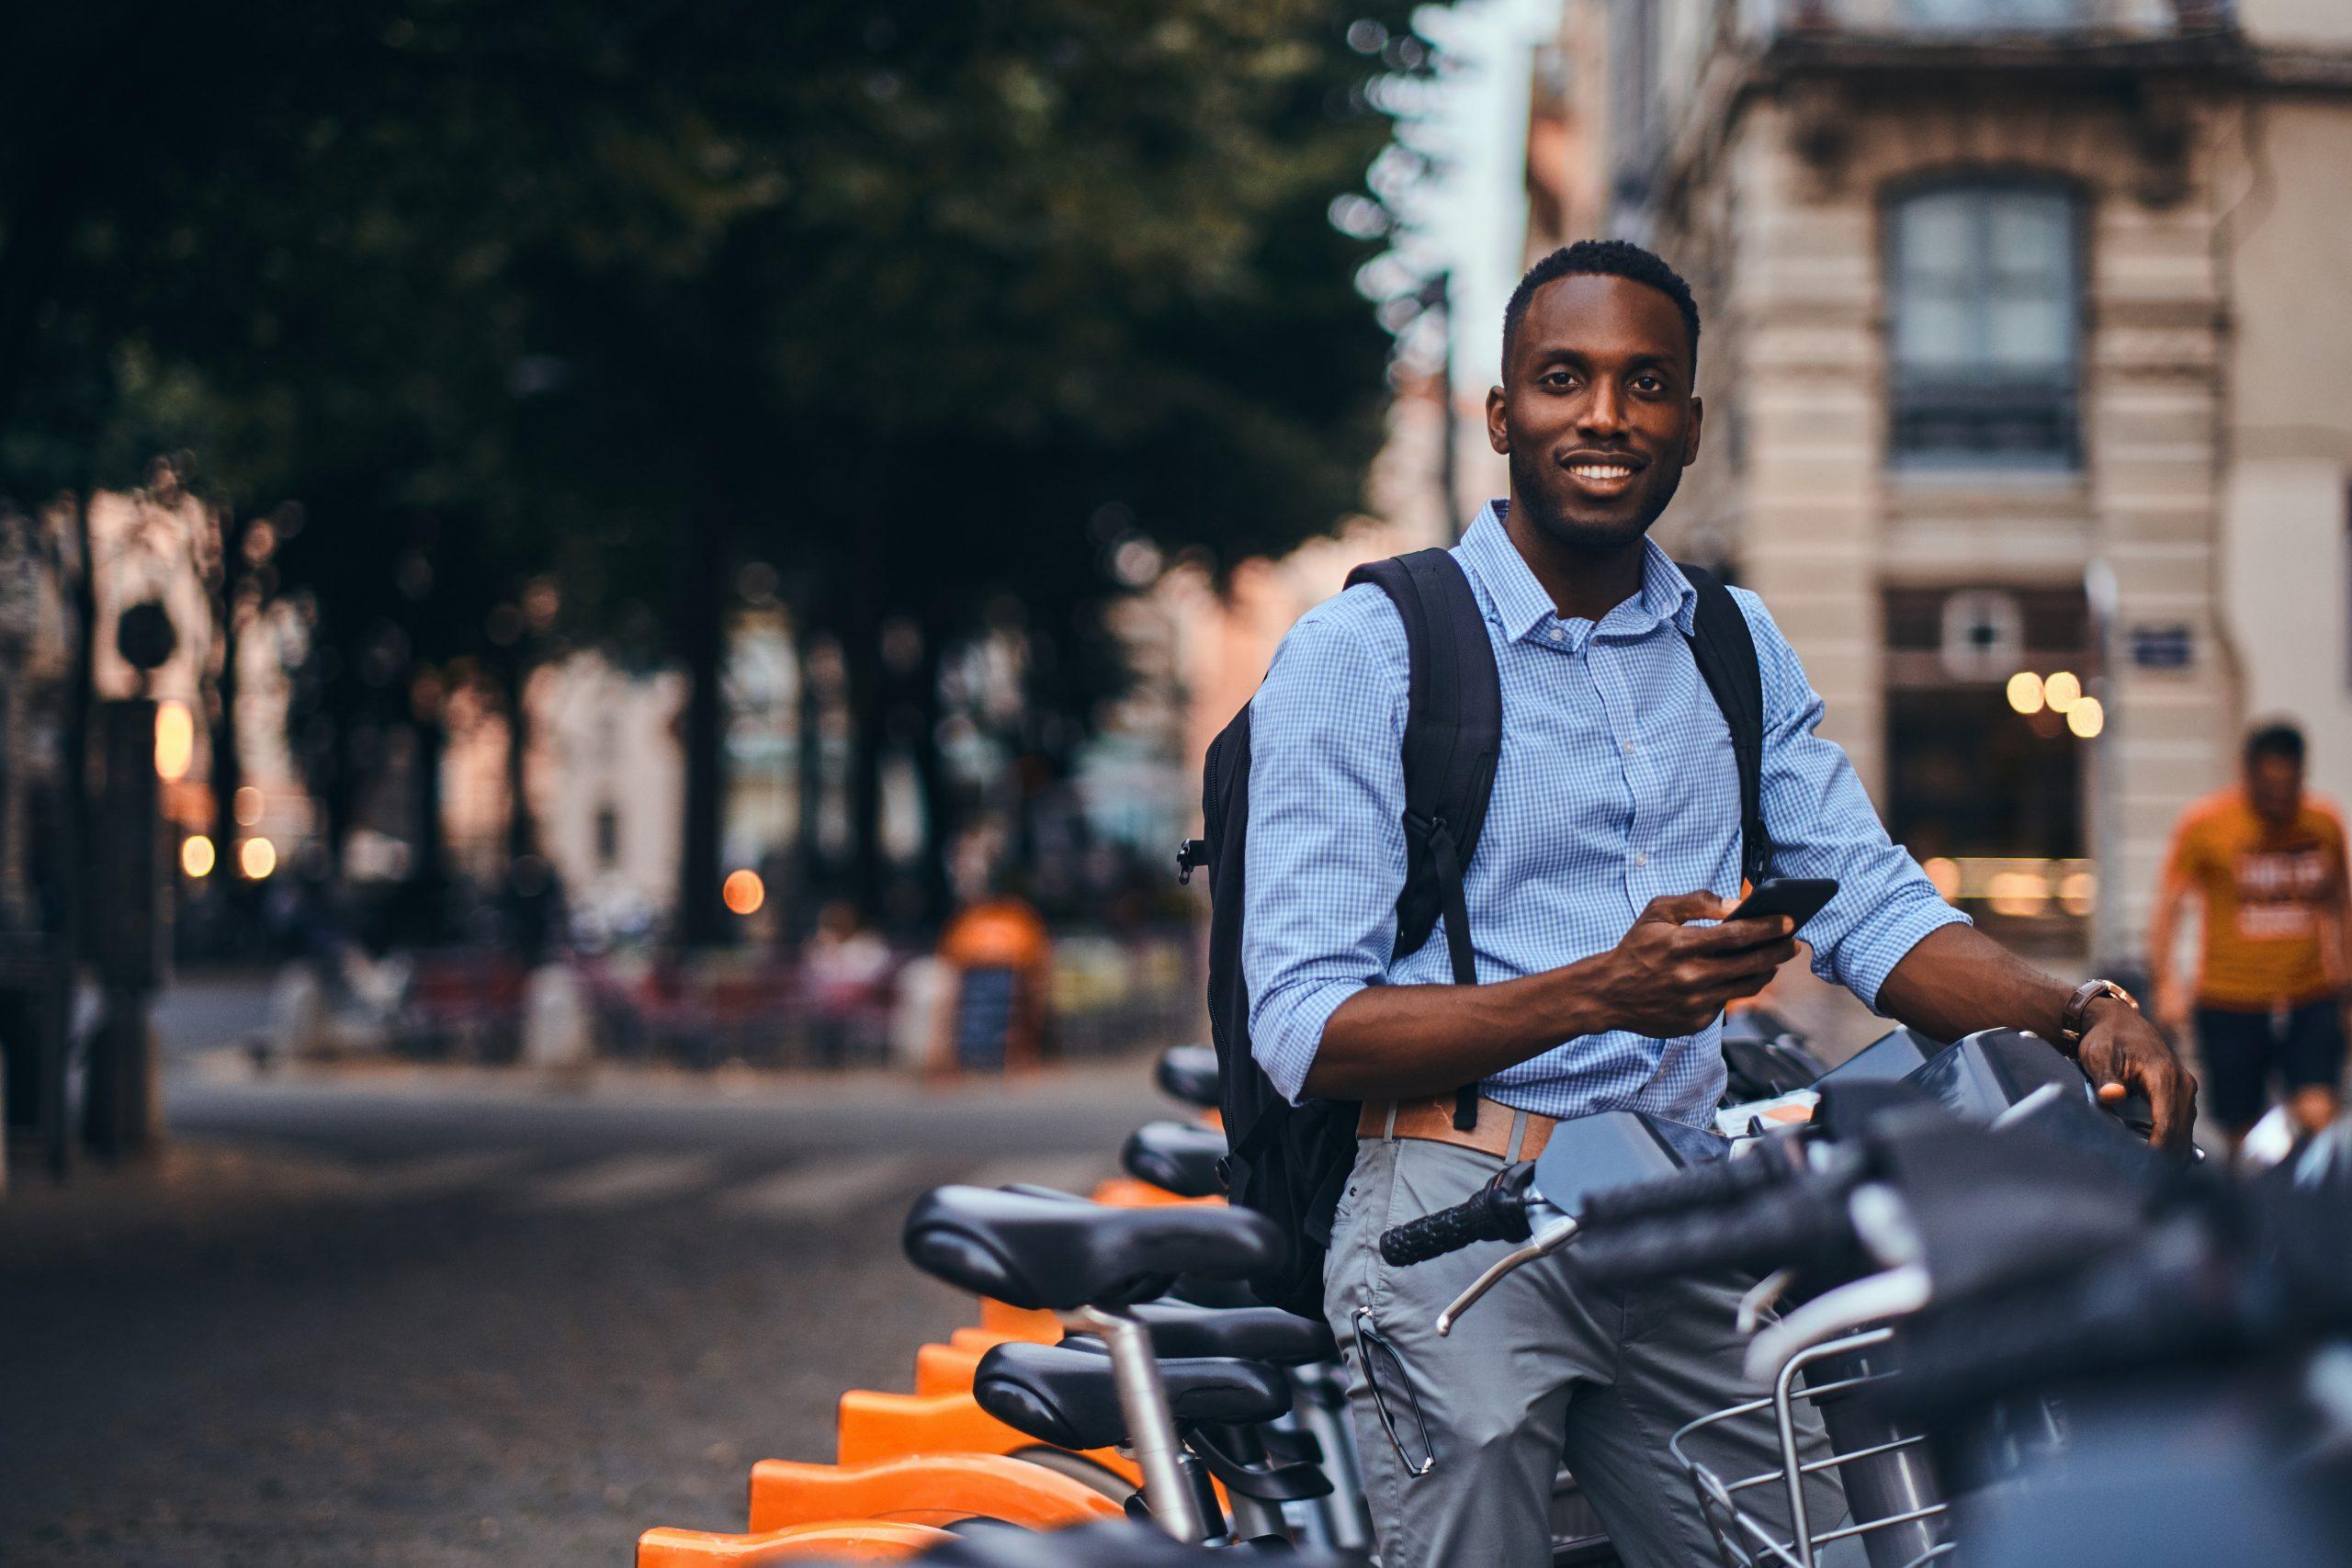 bike rental solution